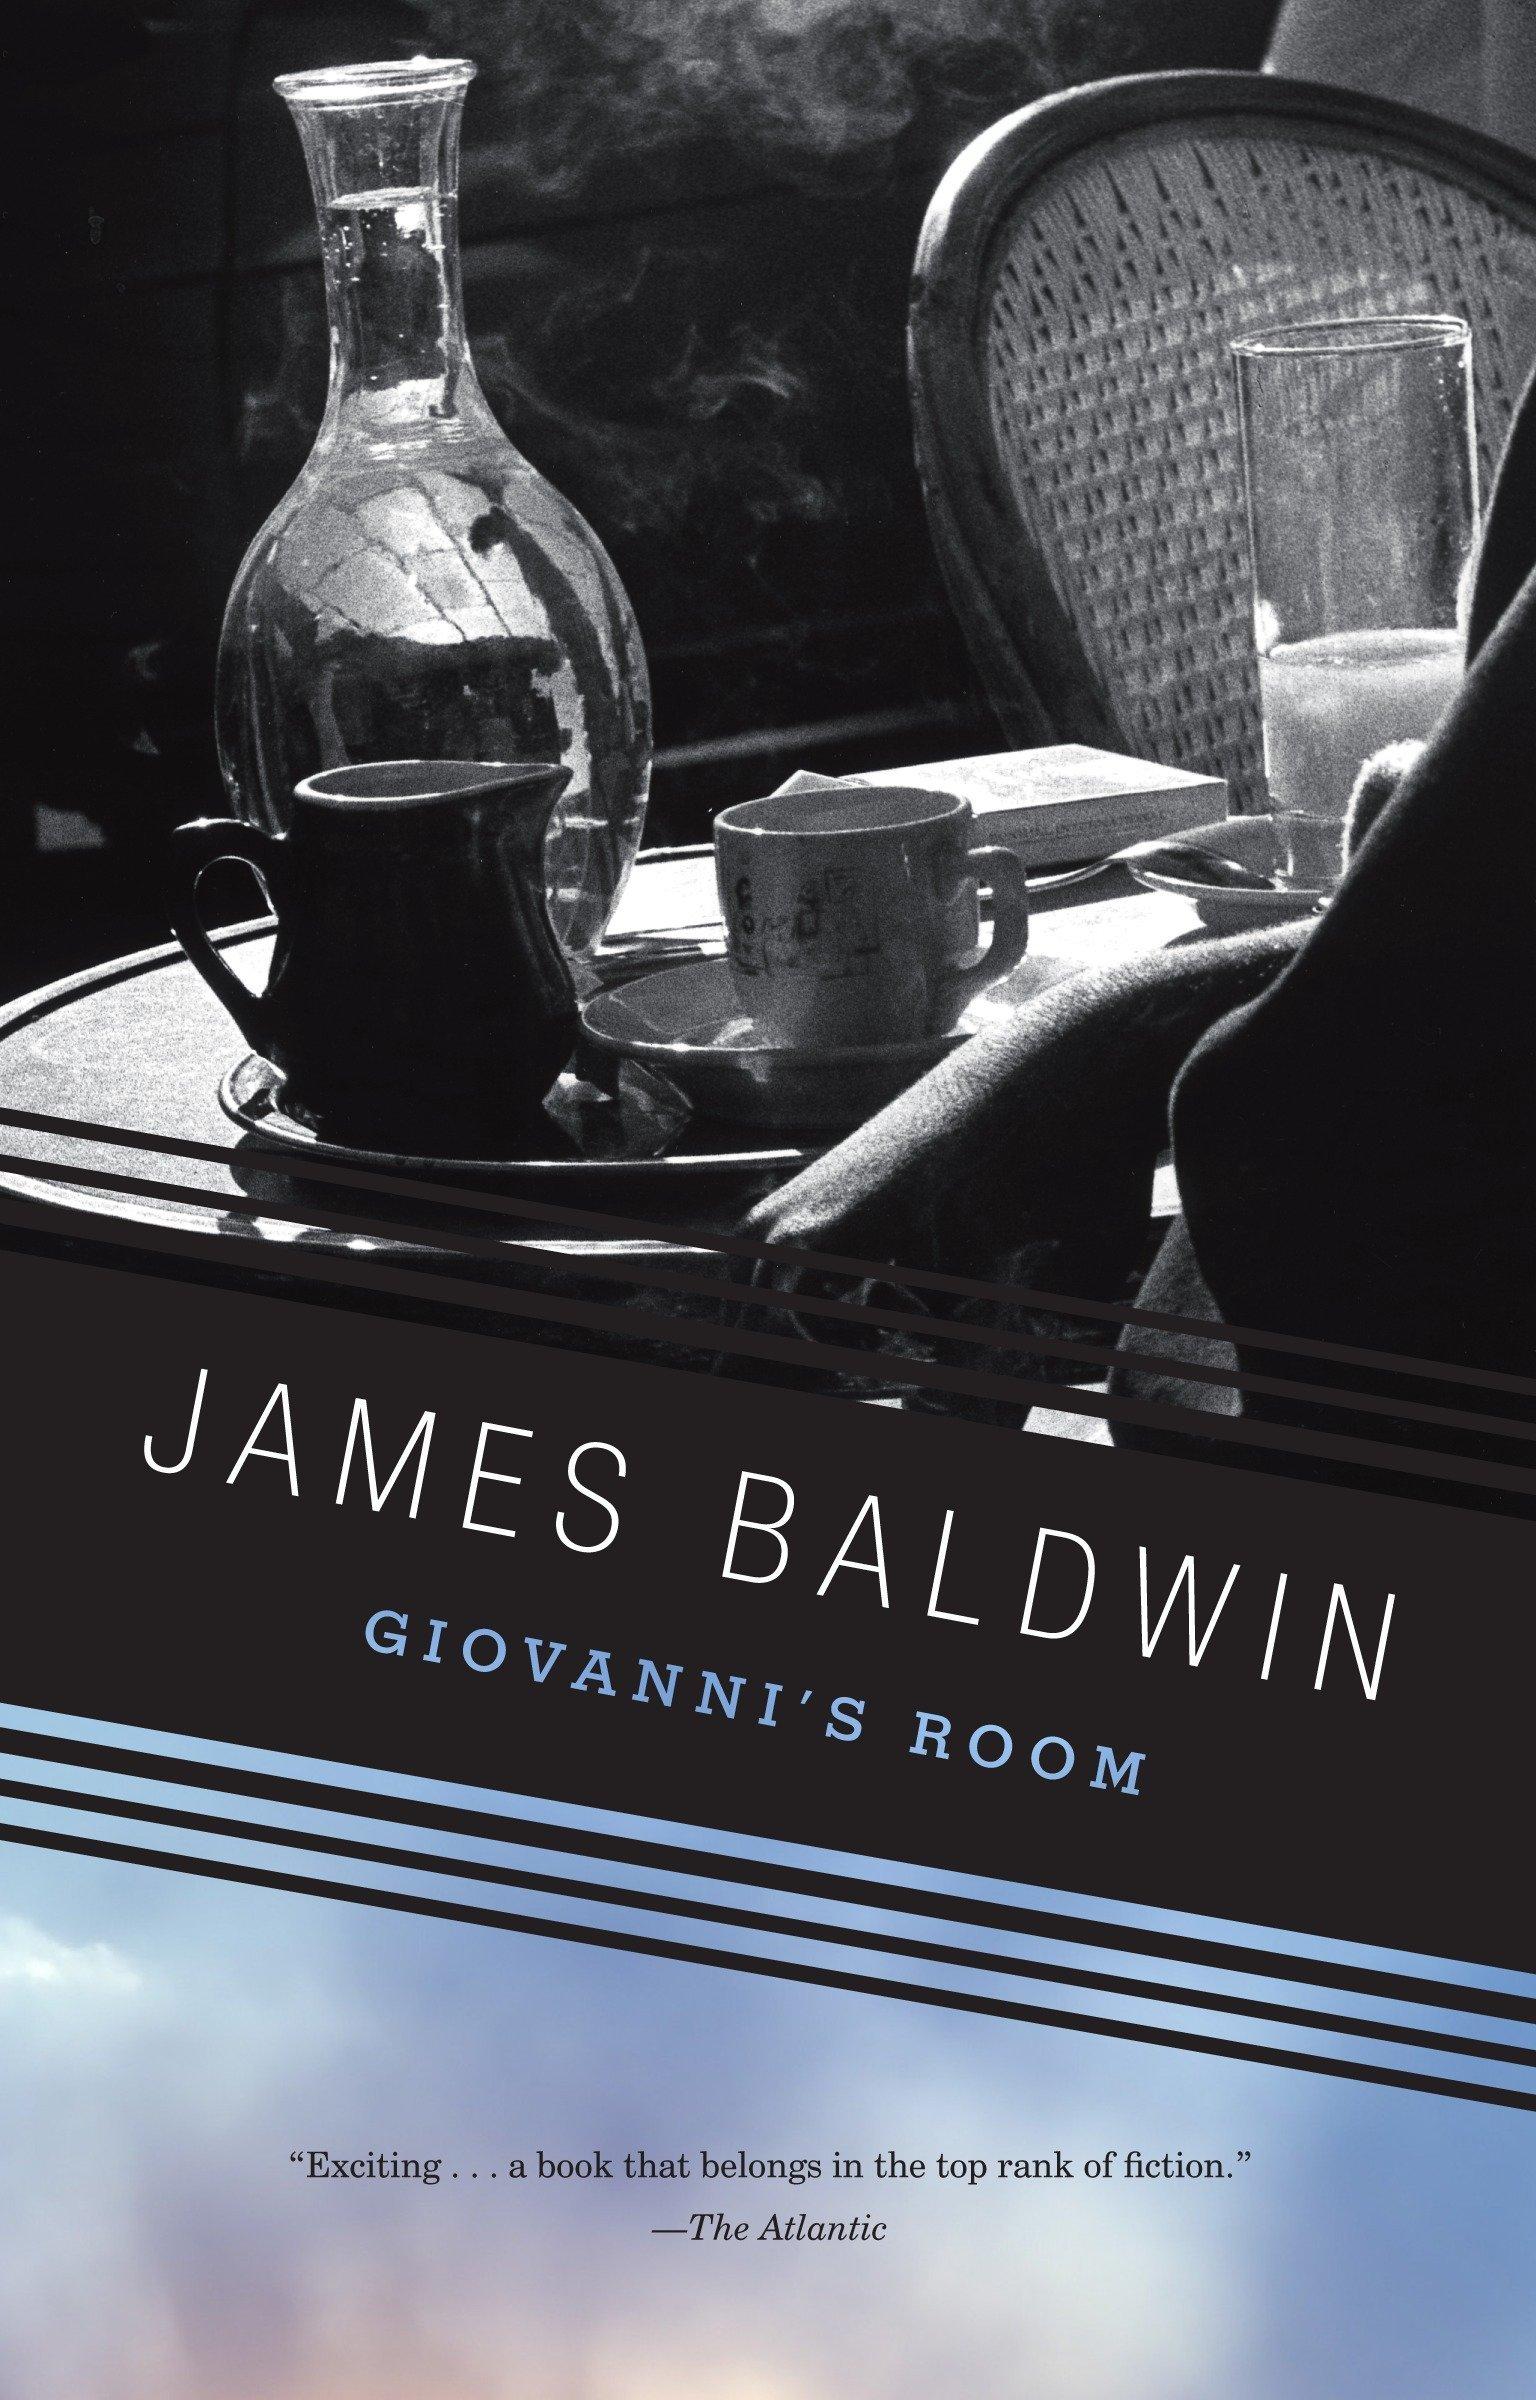 Amazon.com: Giovanni's Room (9780345806567): James Baldwin: Books